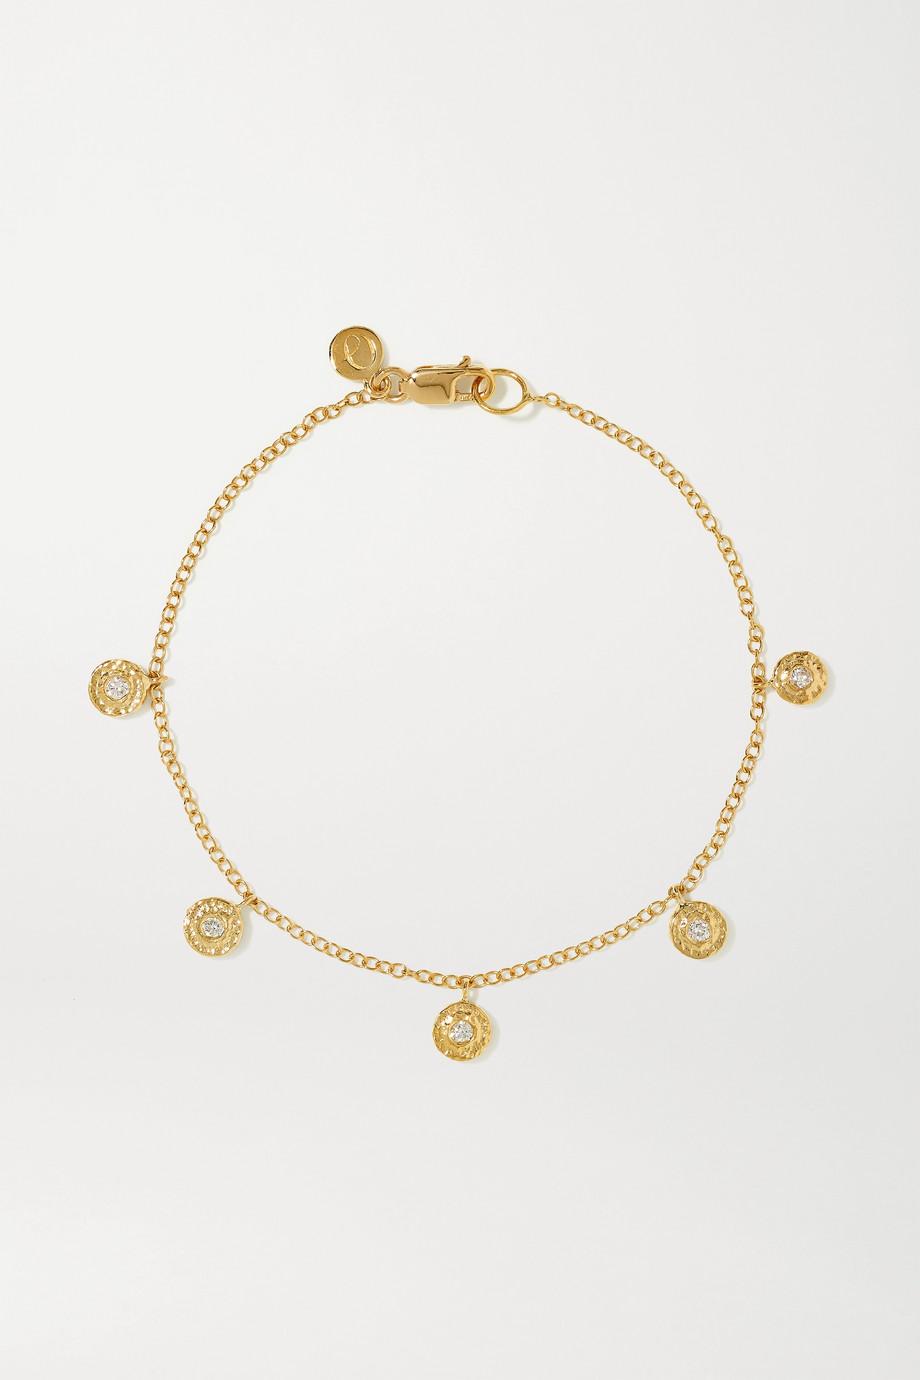 Octavia Elizabeth + NET SUSTAIN Nesting Gem 18-karat recycled gold diamond bracelet